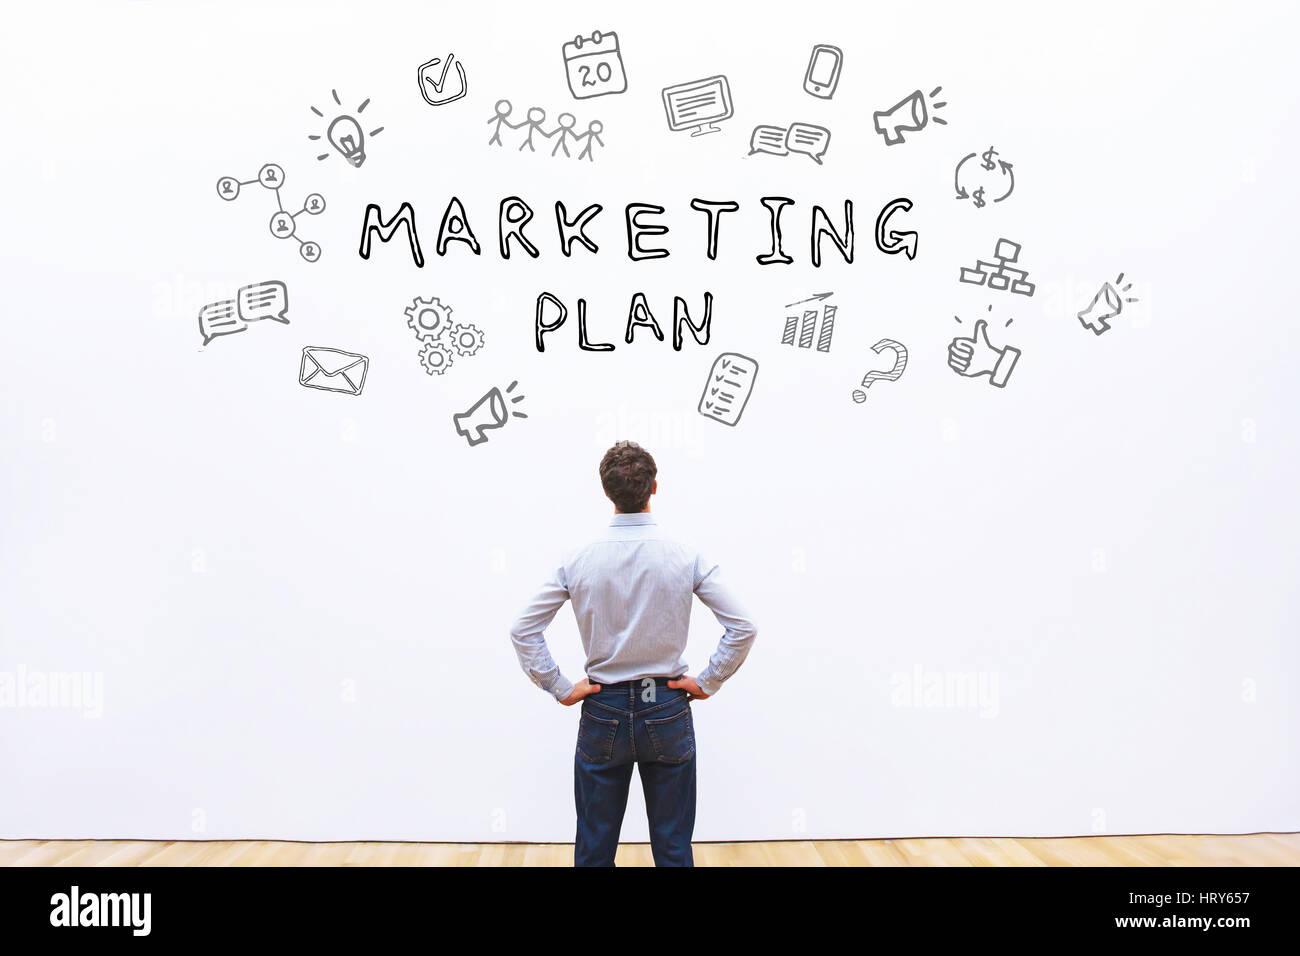 marketing plan concept - Stock Image